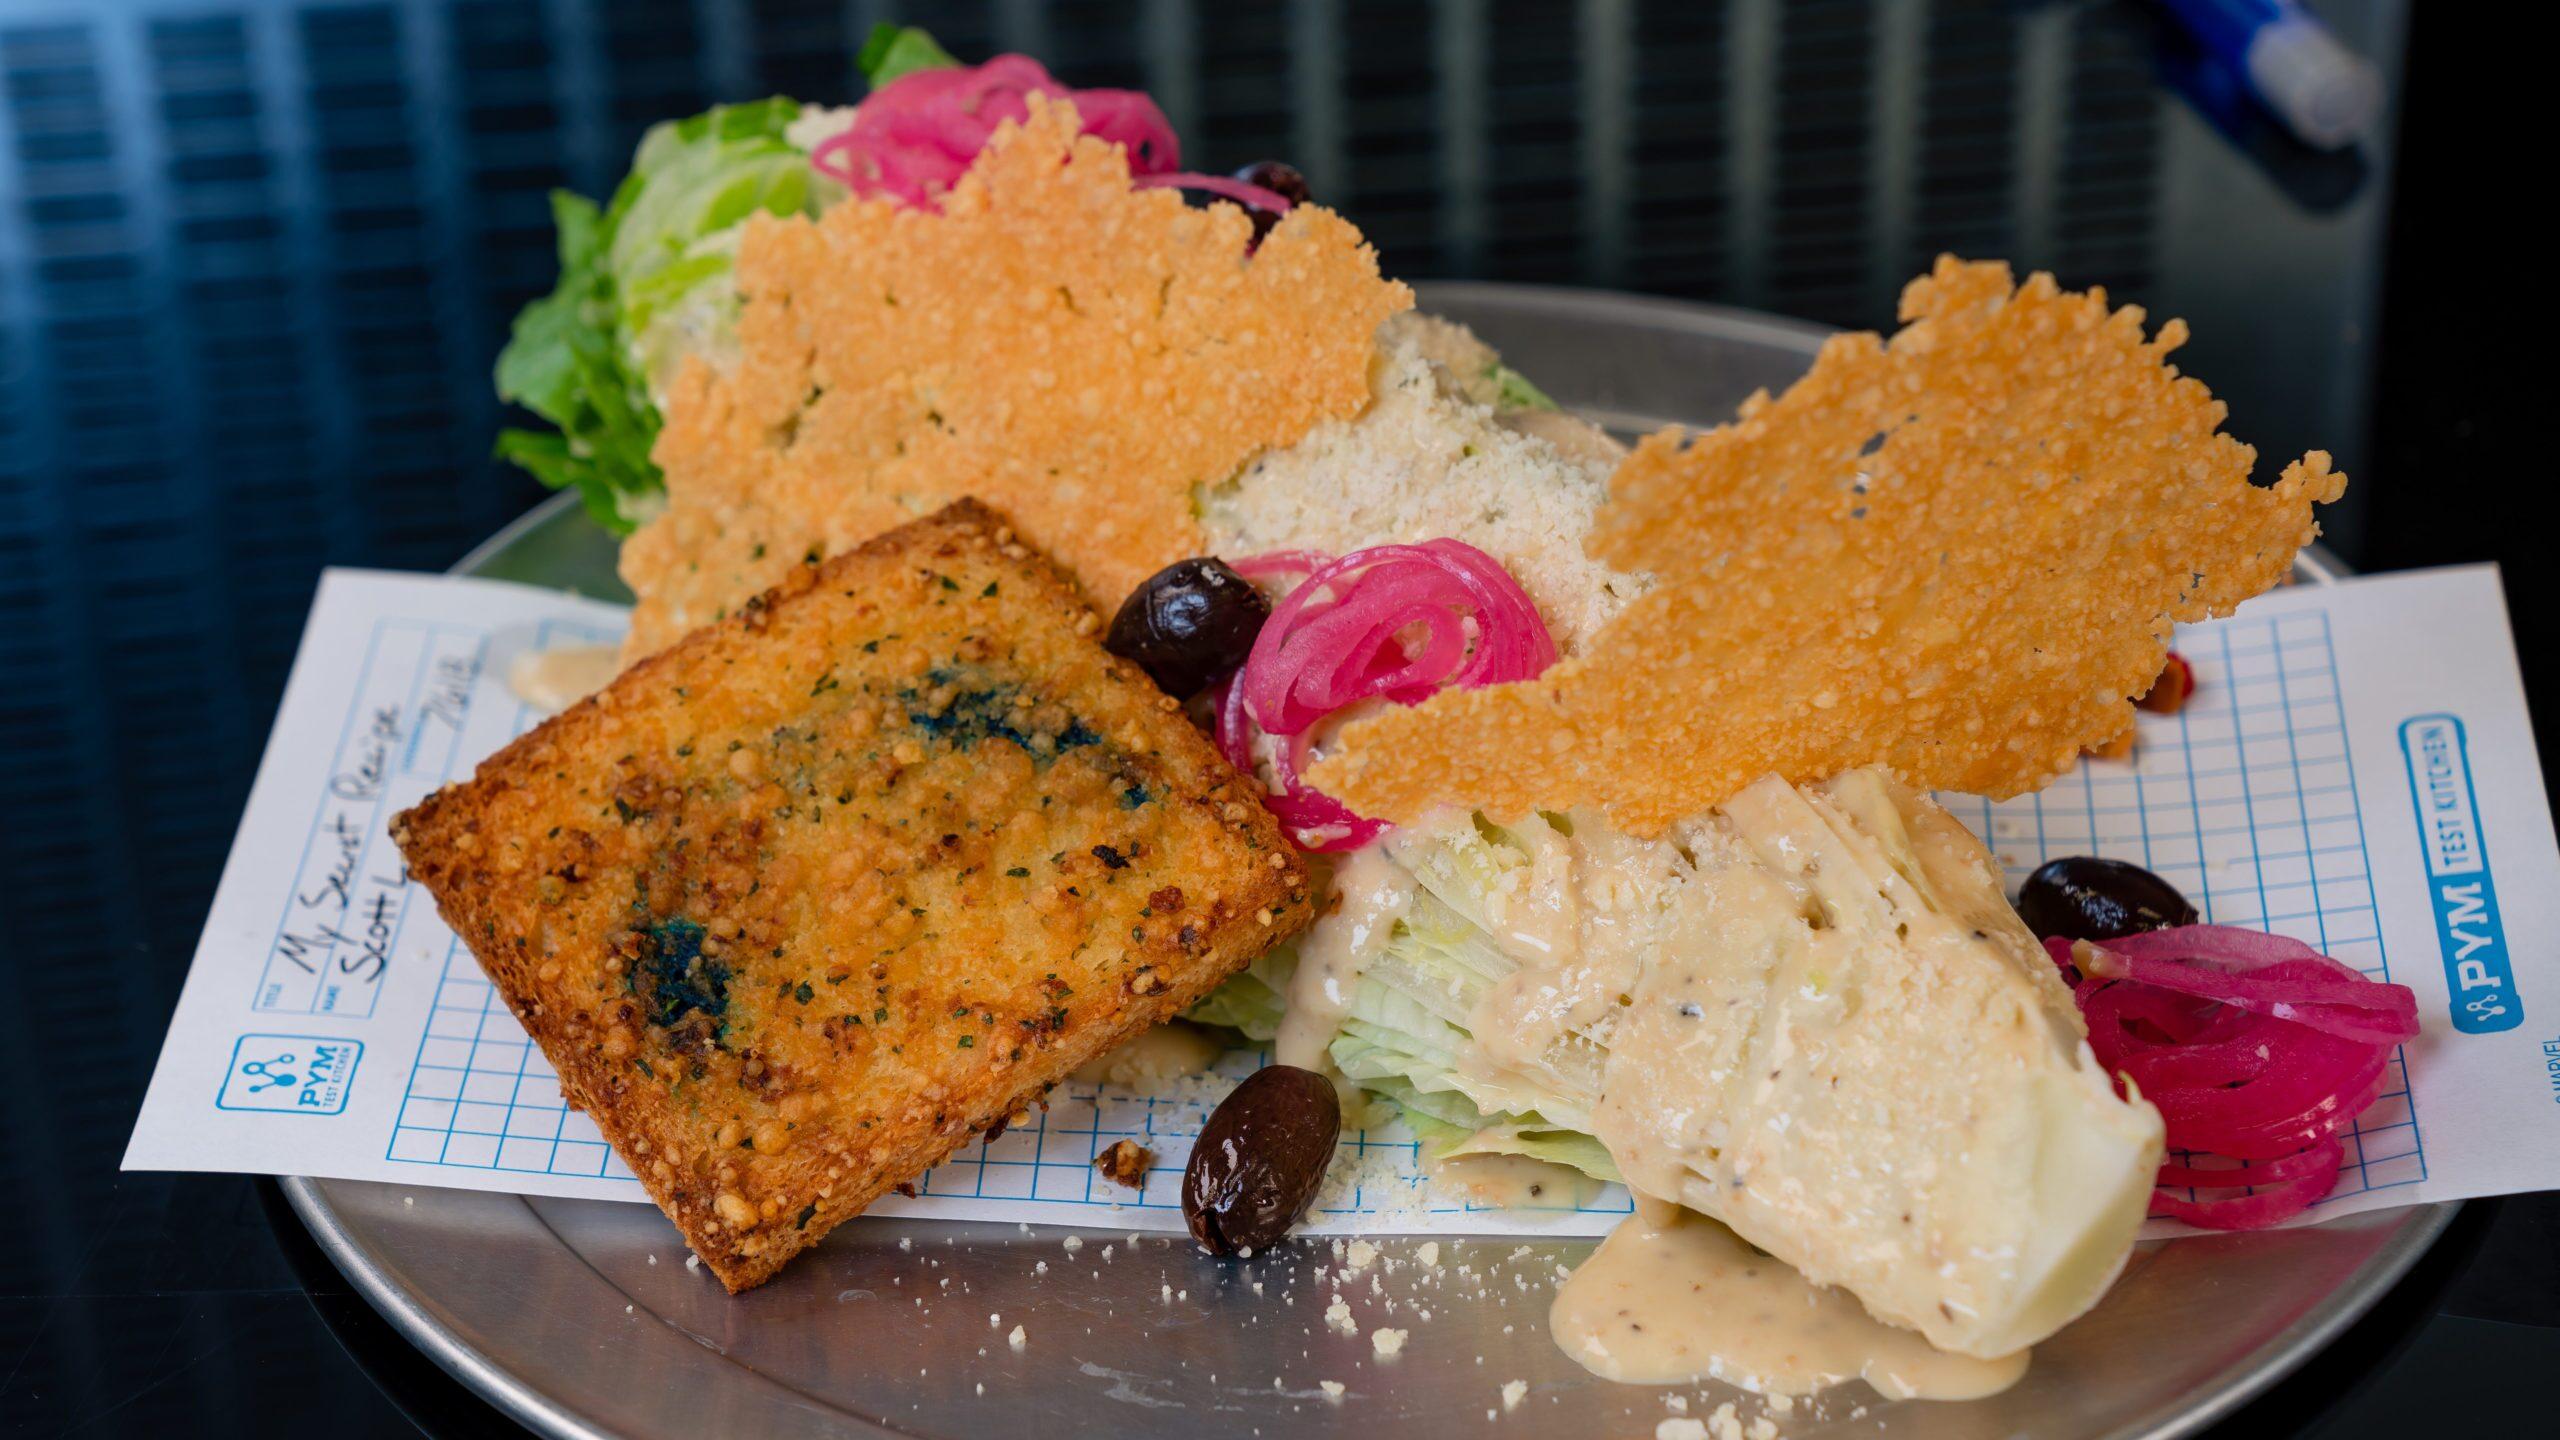 Avengers Campus Food & Beverage Ð Caesar Salad + Colossal Crouton